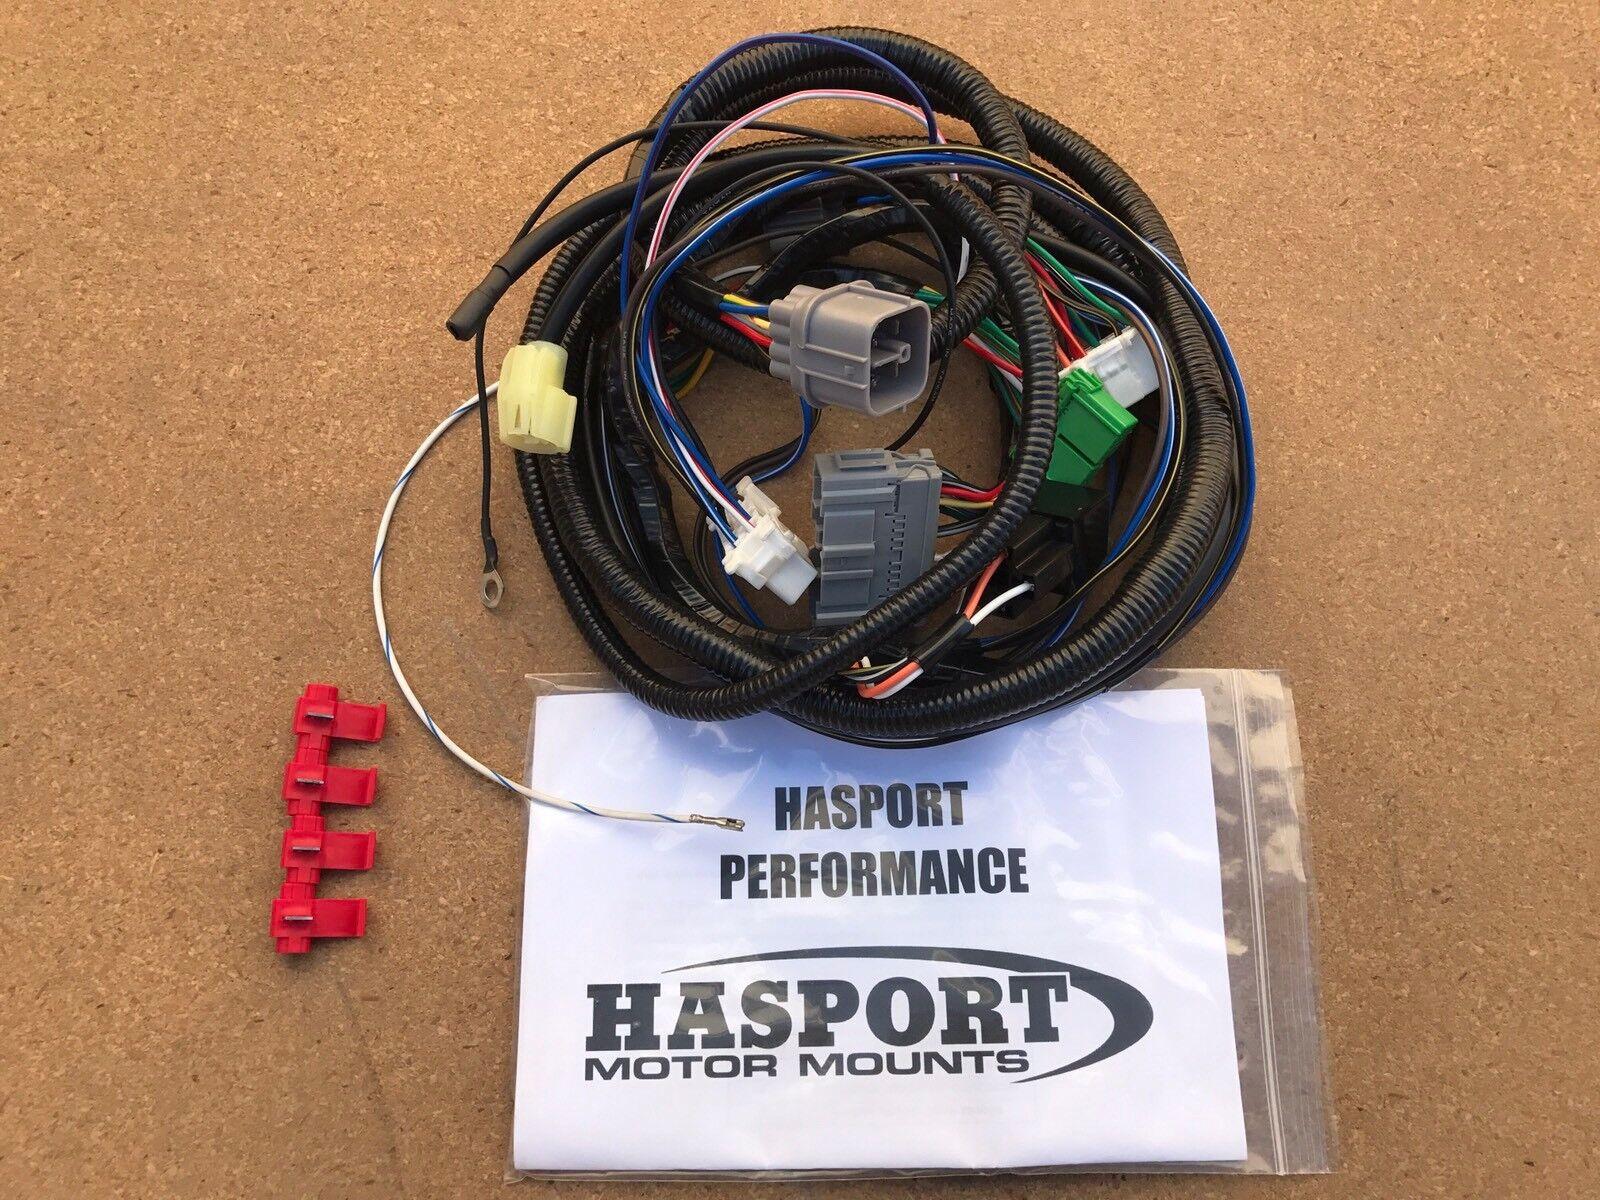 hasport k series swap subharness 99 00 civic ekwk 2 ekwk2 conversion Wiring Harness Diagram norton secured powered by verisign